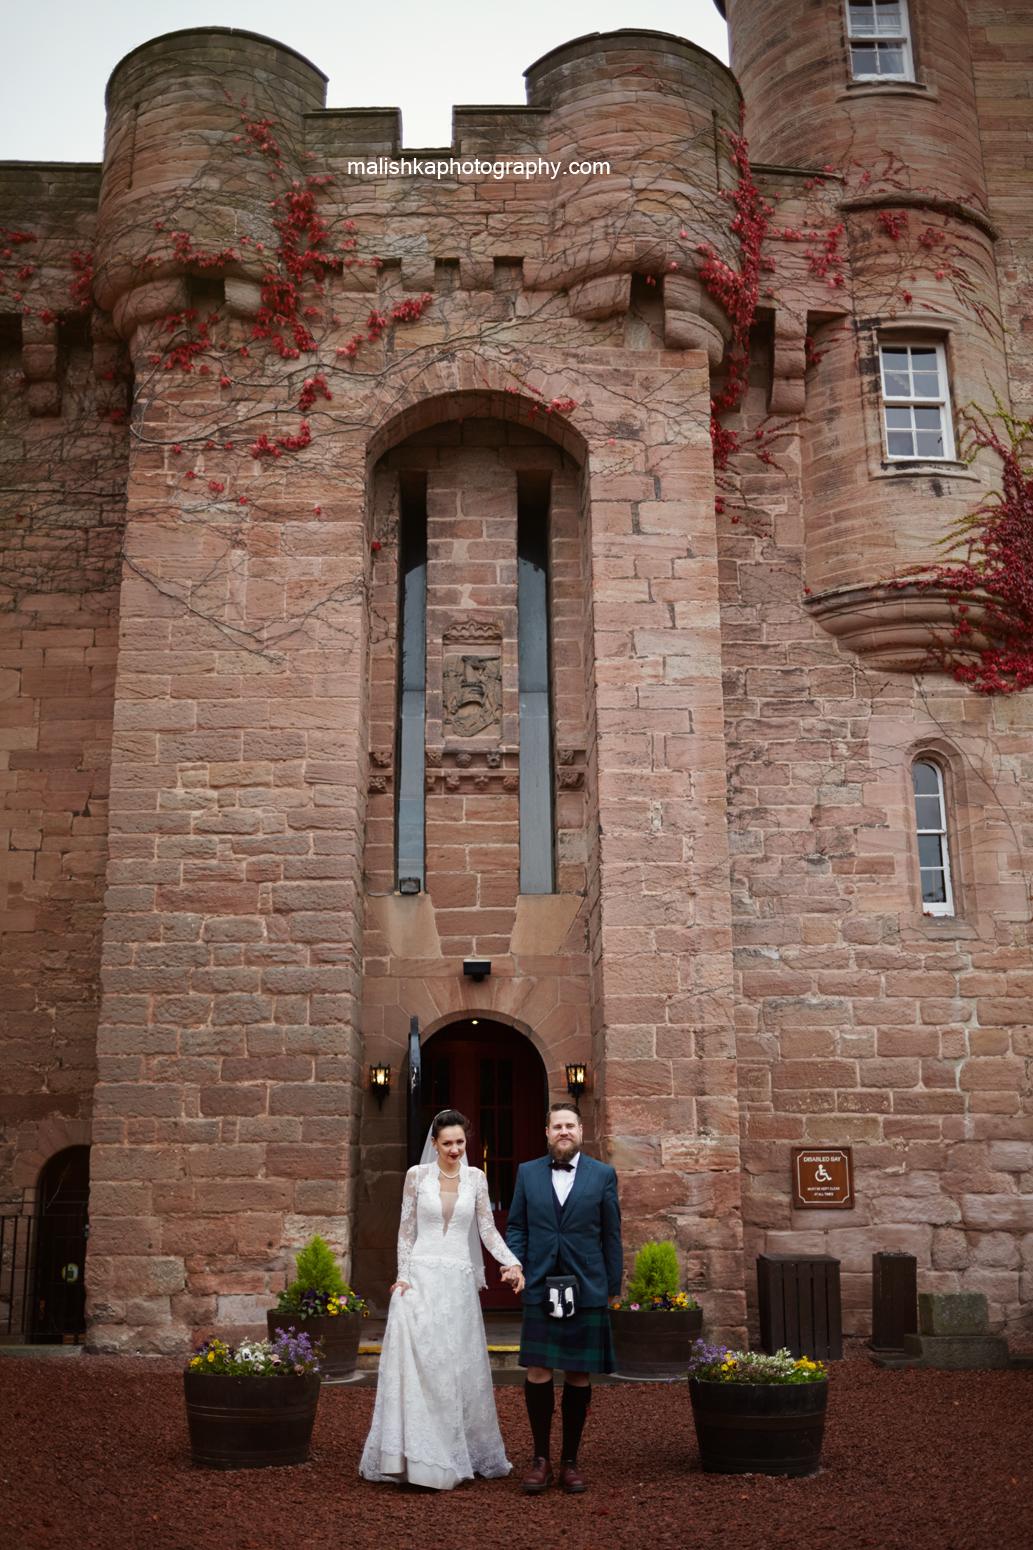 Entrance to the  Dalhousie Castle